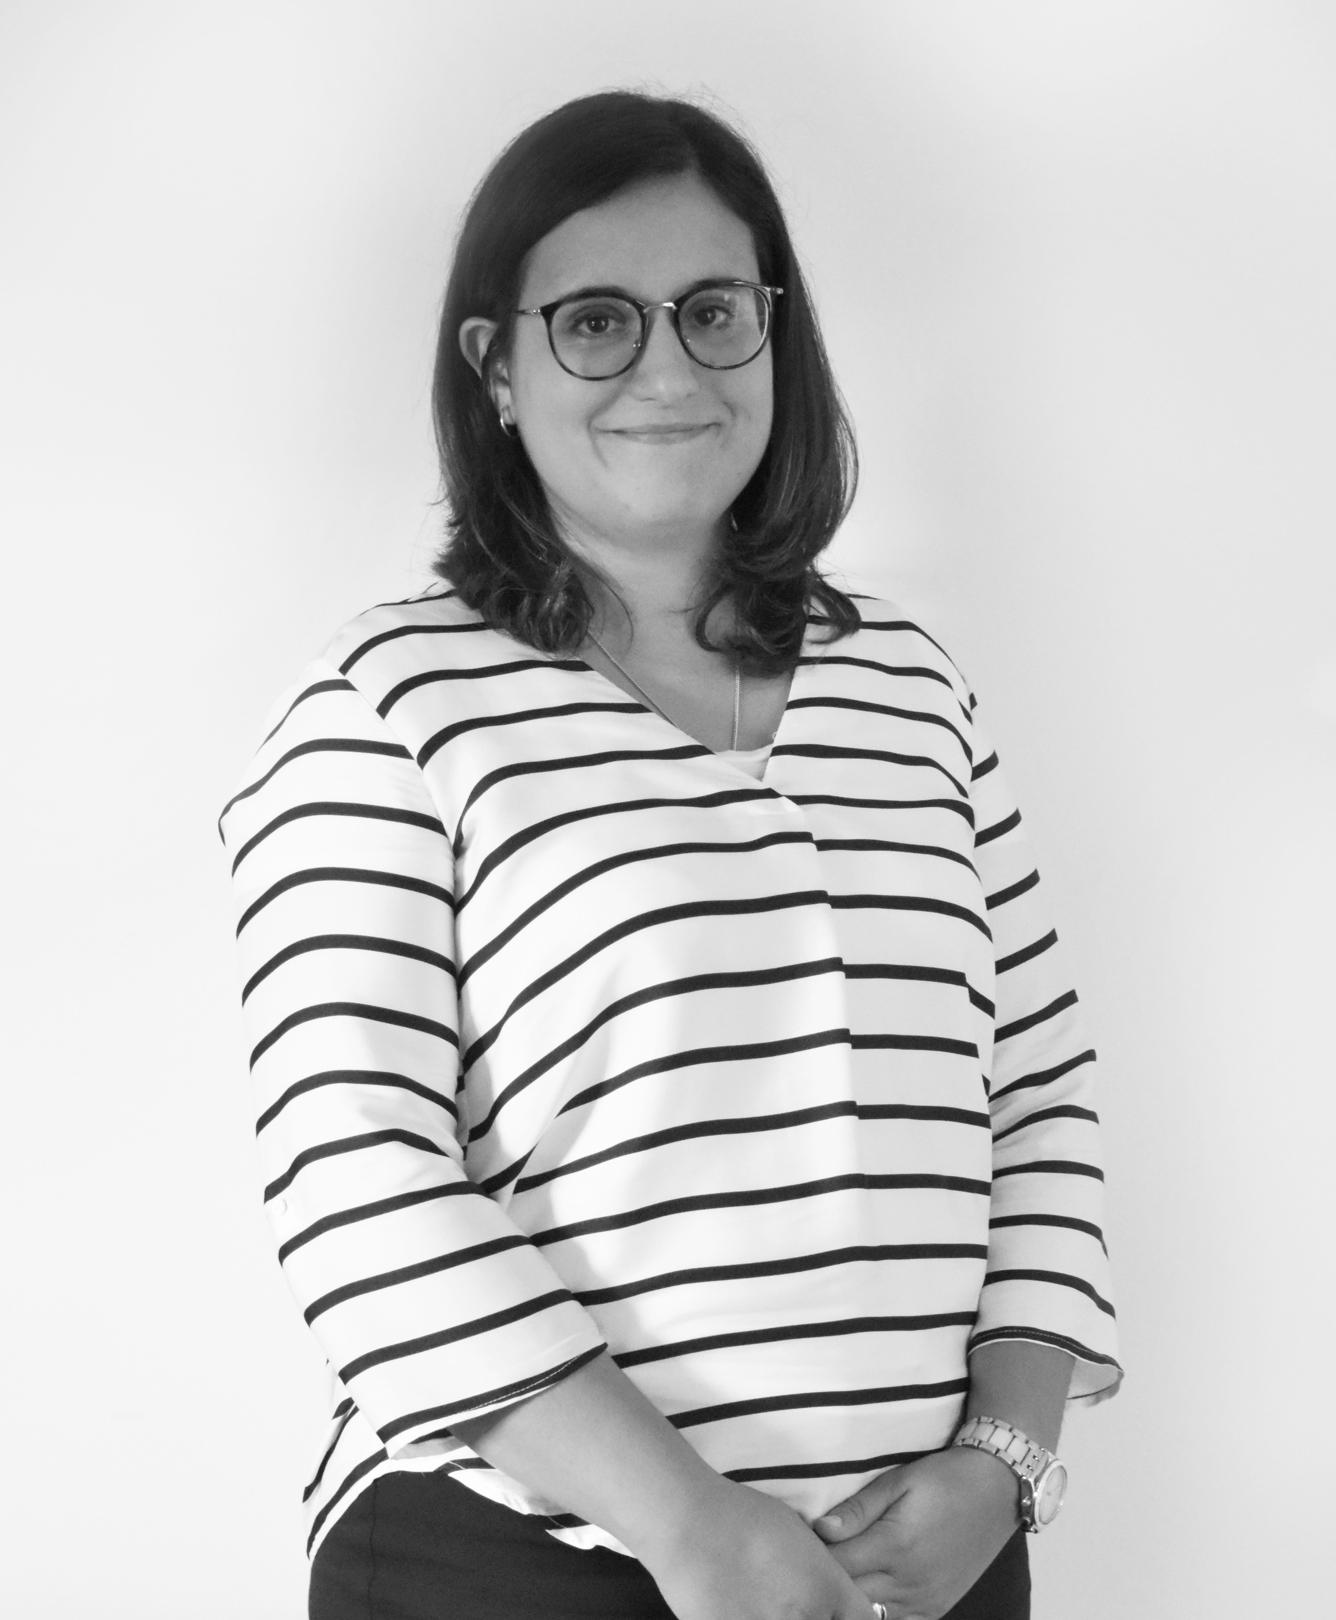 Margarida Góis Moreira foto.